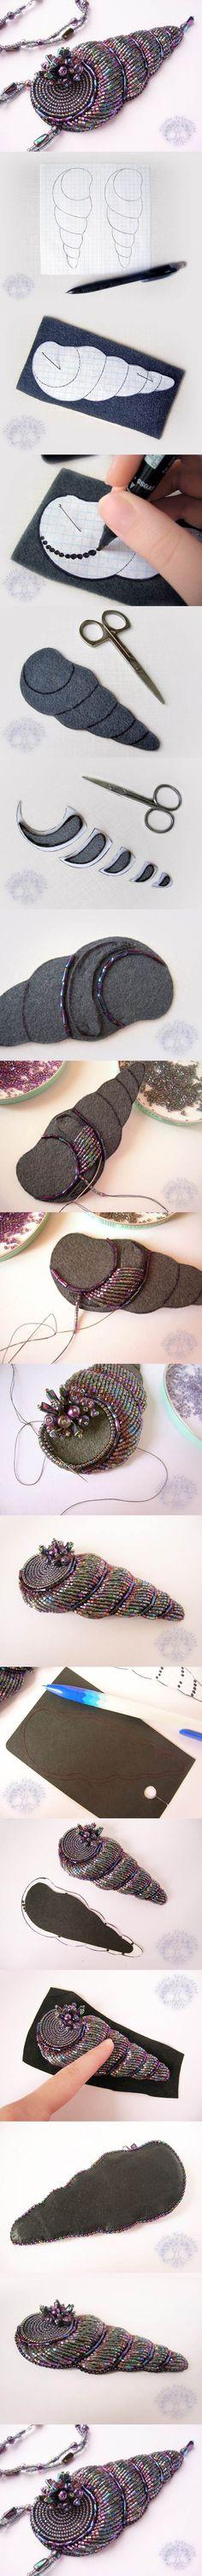 DIY Beaded Spiral Shell Pendant | iCreativeIdeas.com